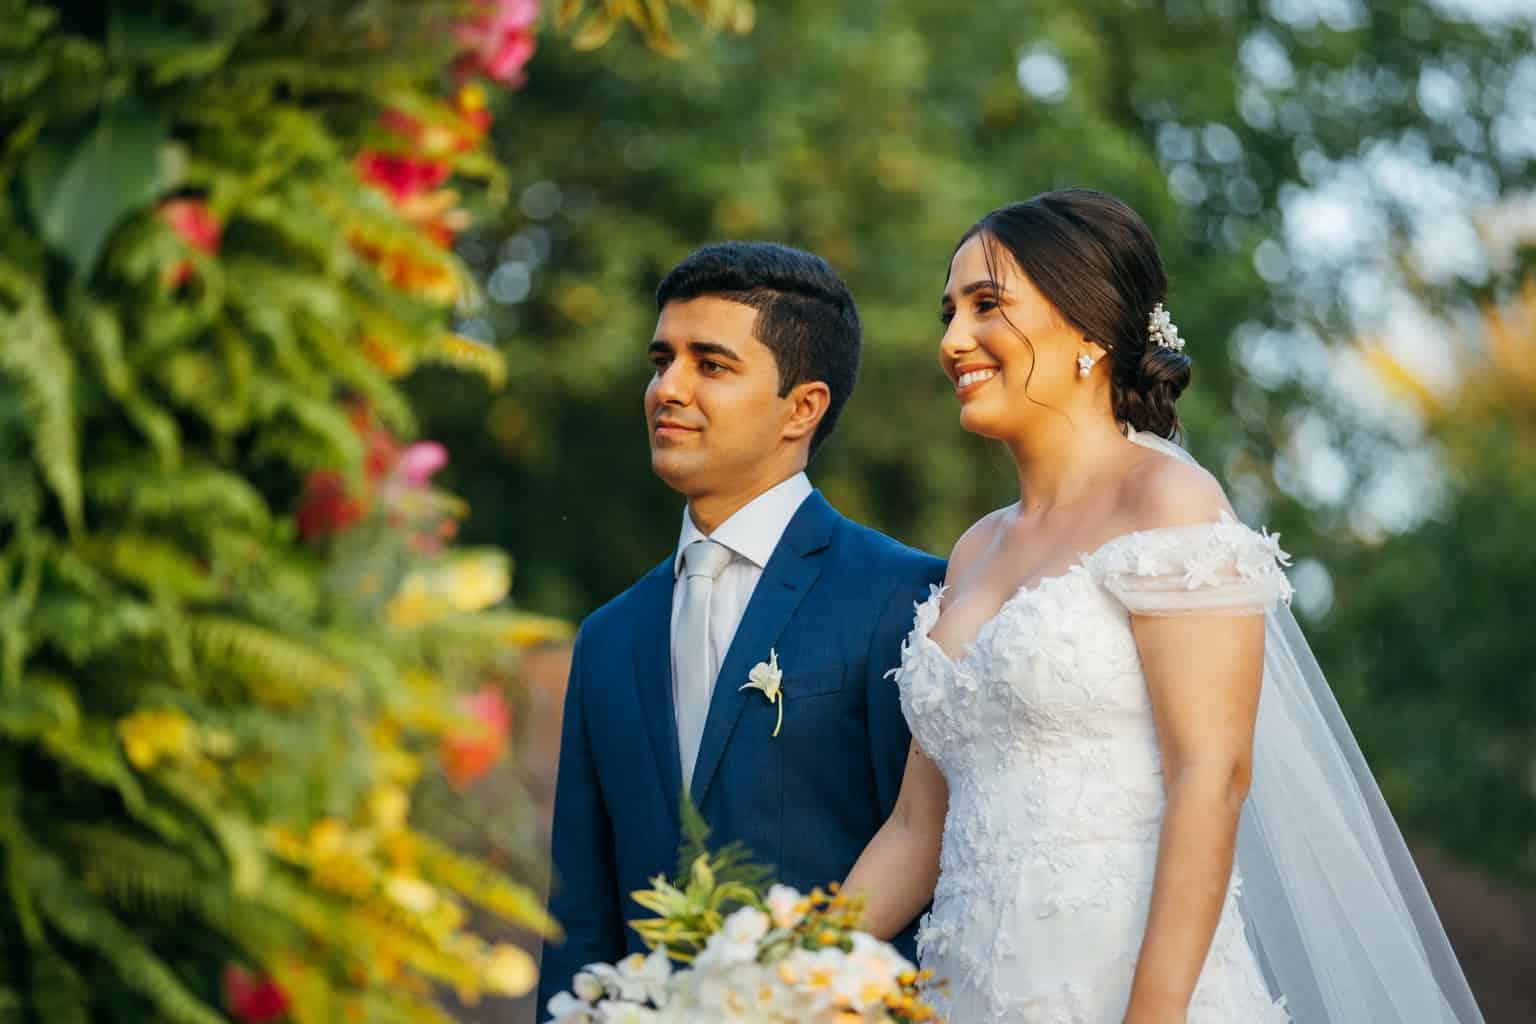 Casamento-Gardenia-e-Marcos-Antonio-Paulo-Bezerra-Joao-Curvelo-Carol-Maiorano-569-cerimonia